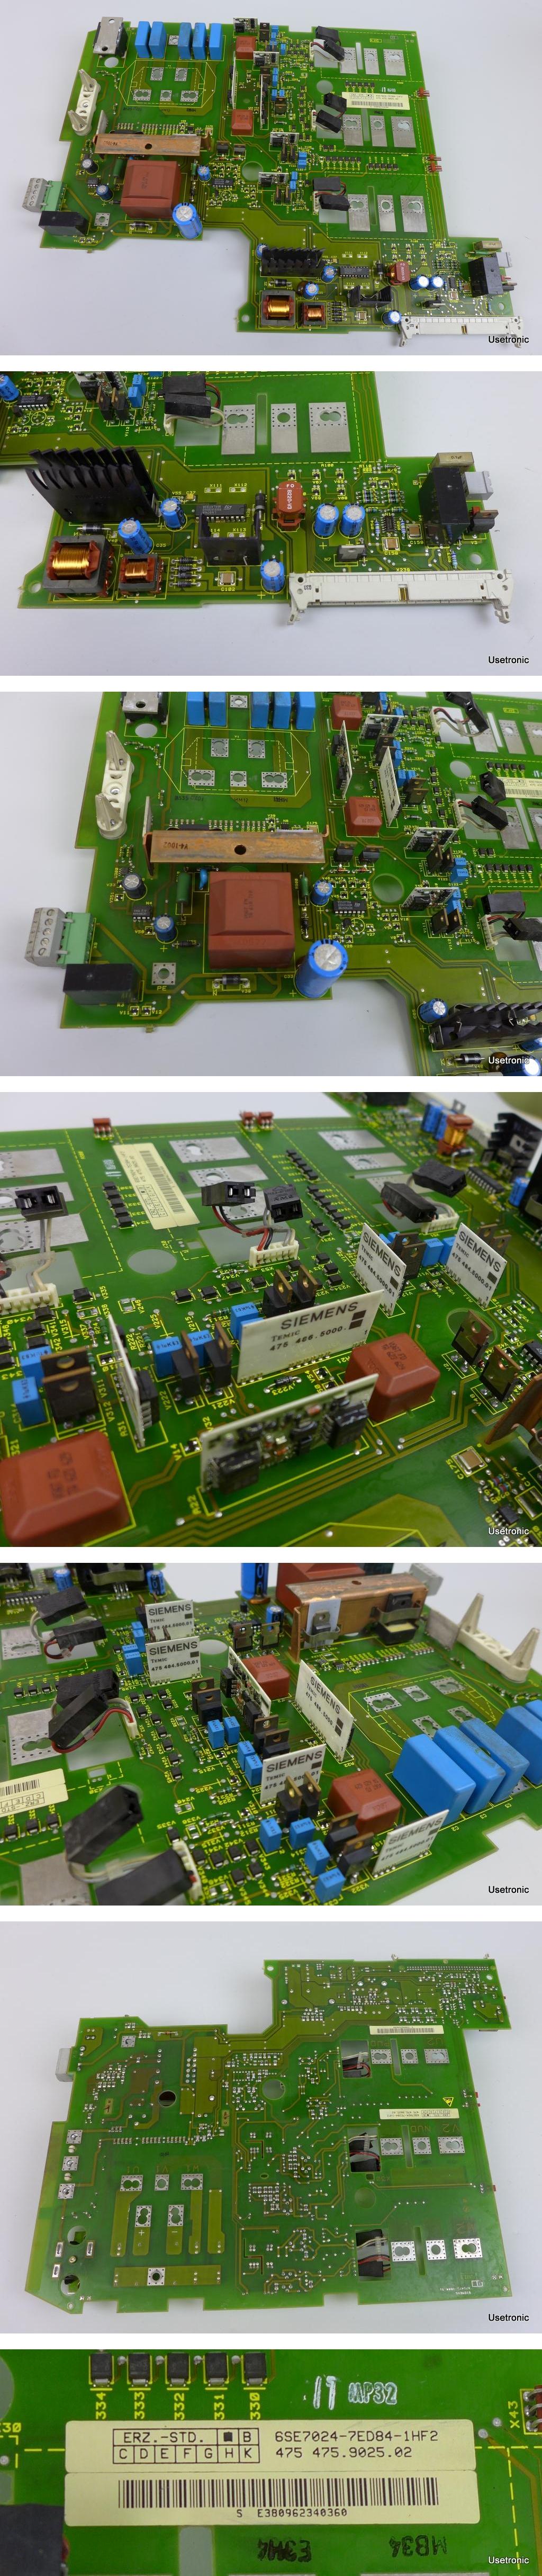 Siemens 6SE7024-7ED84-1HF2